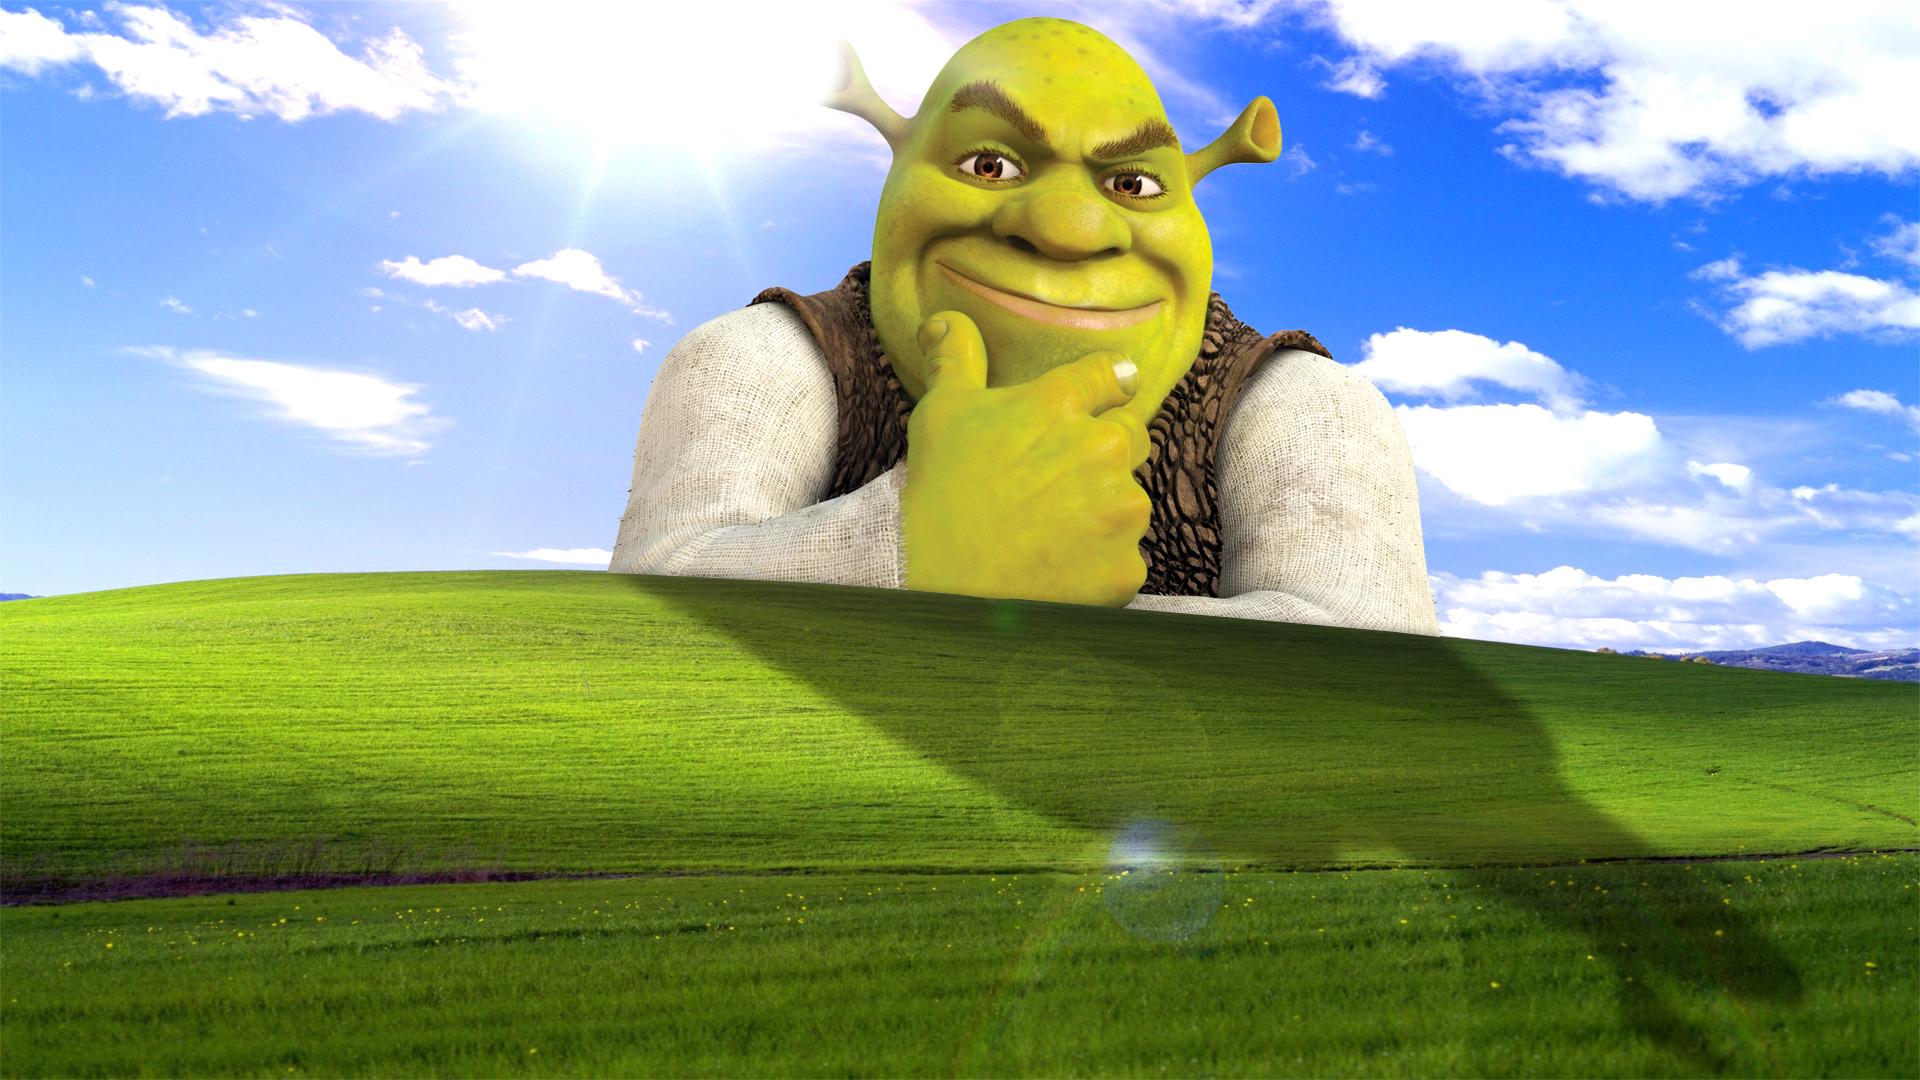 Meme Shrek Wallpaper Meme Background Shrek Cartoon Smoke